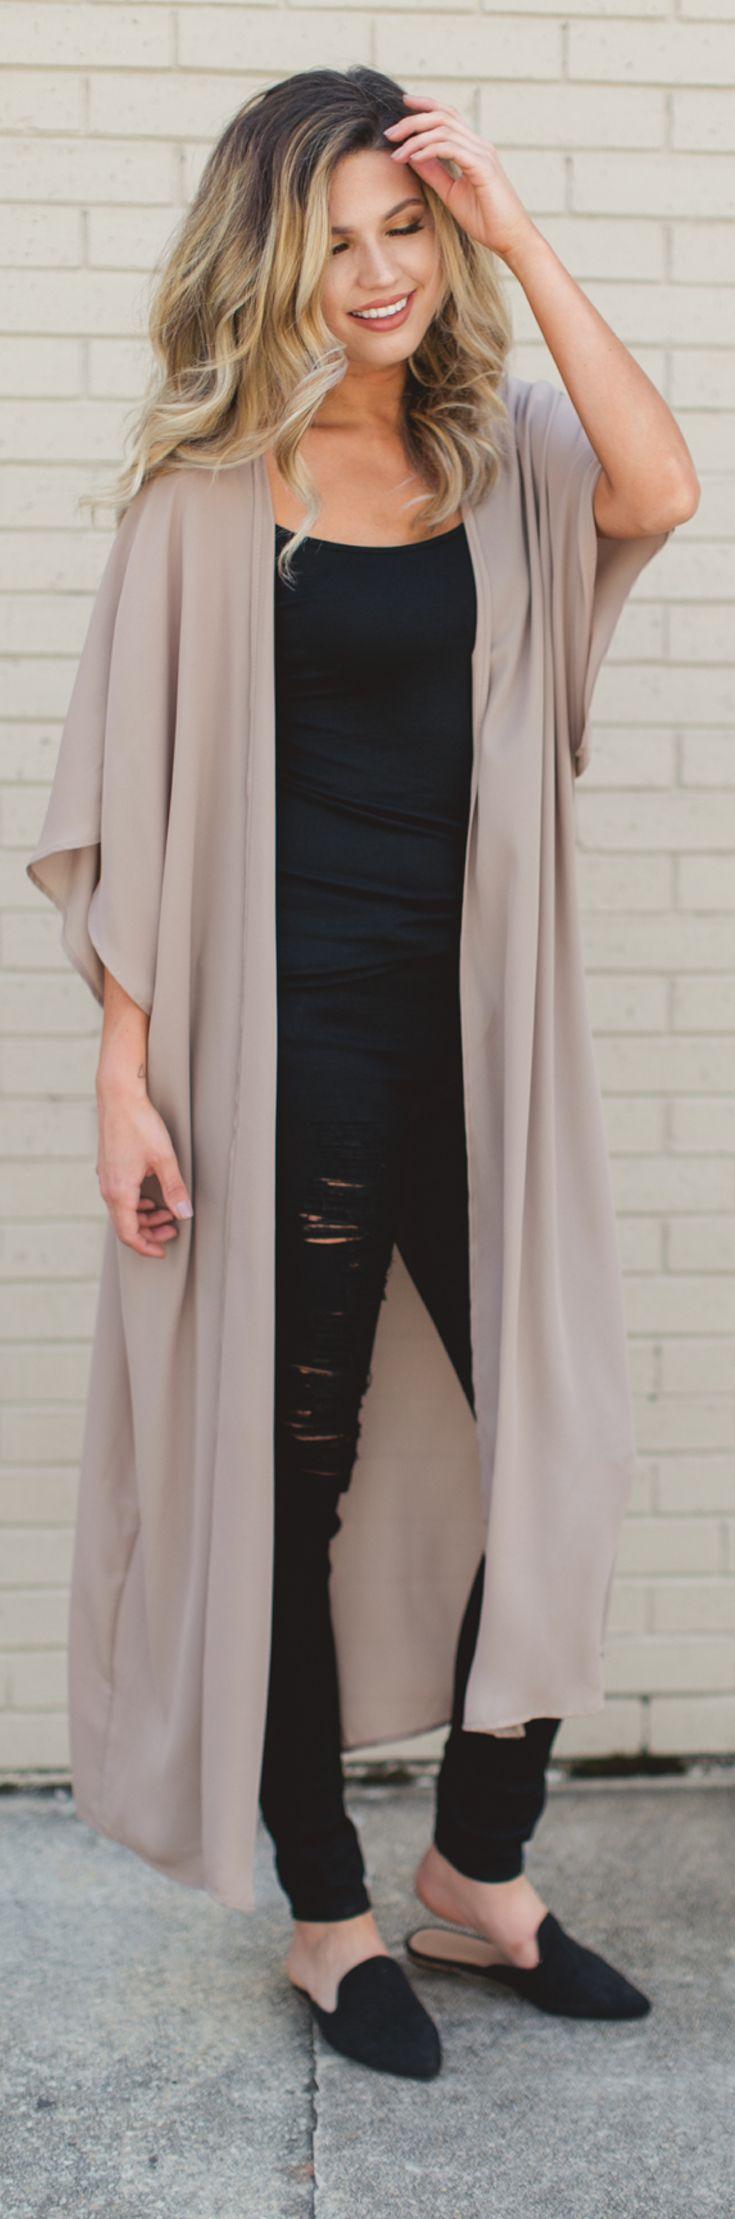 Kimono over black - 9 to 5 - fresh fashion trends - fall 2017 fashion - duster cardigan